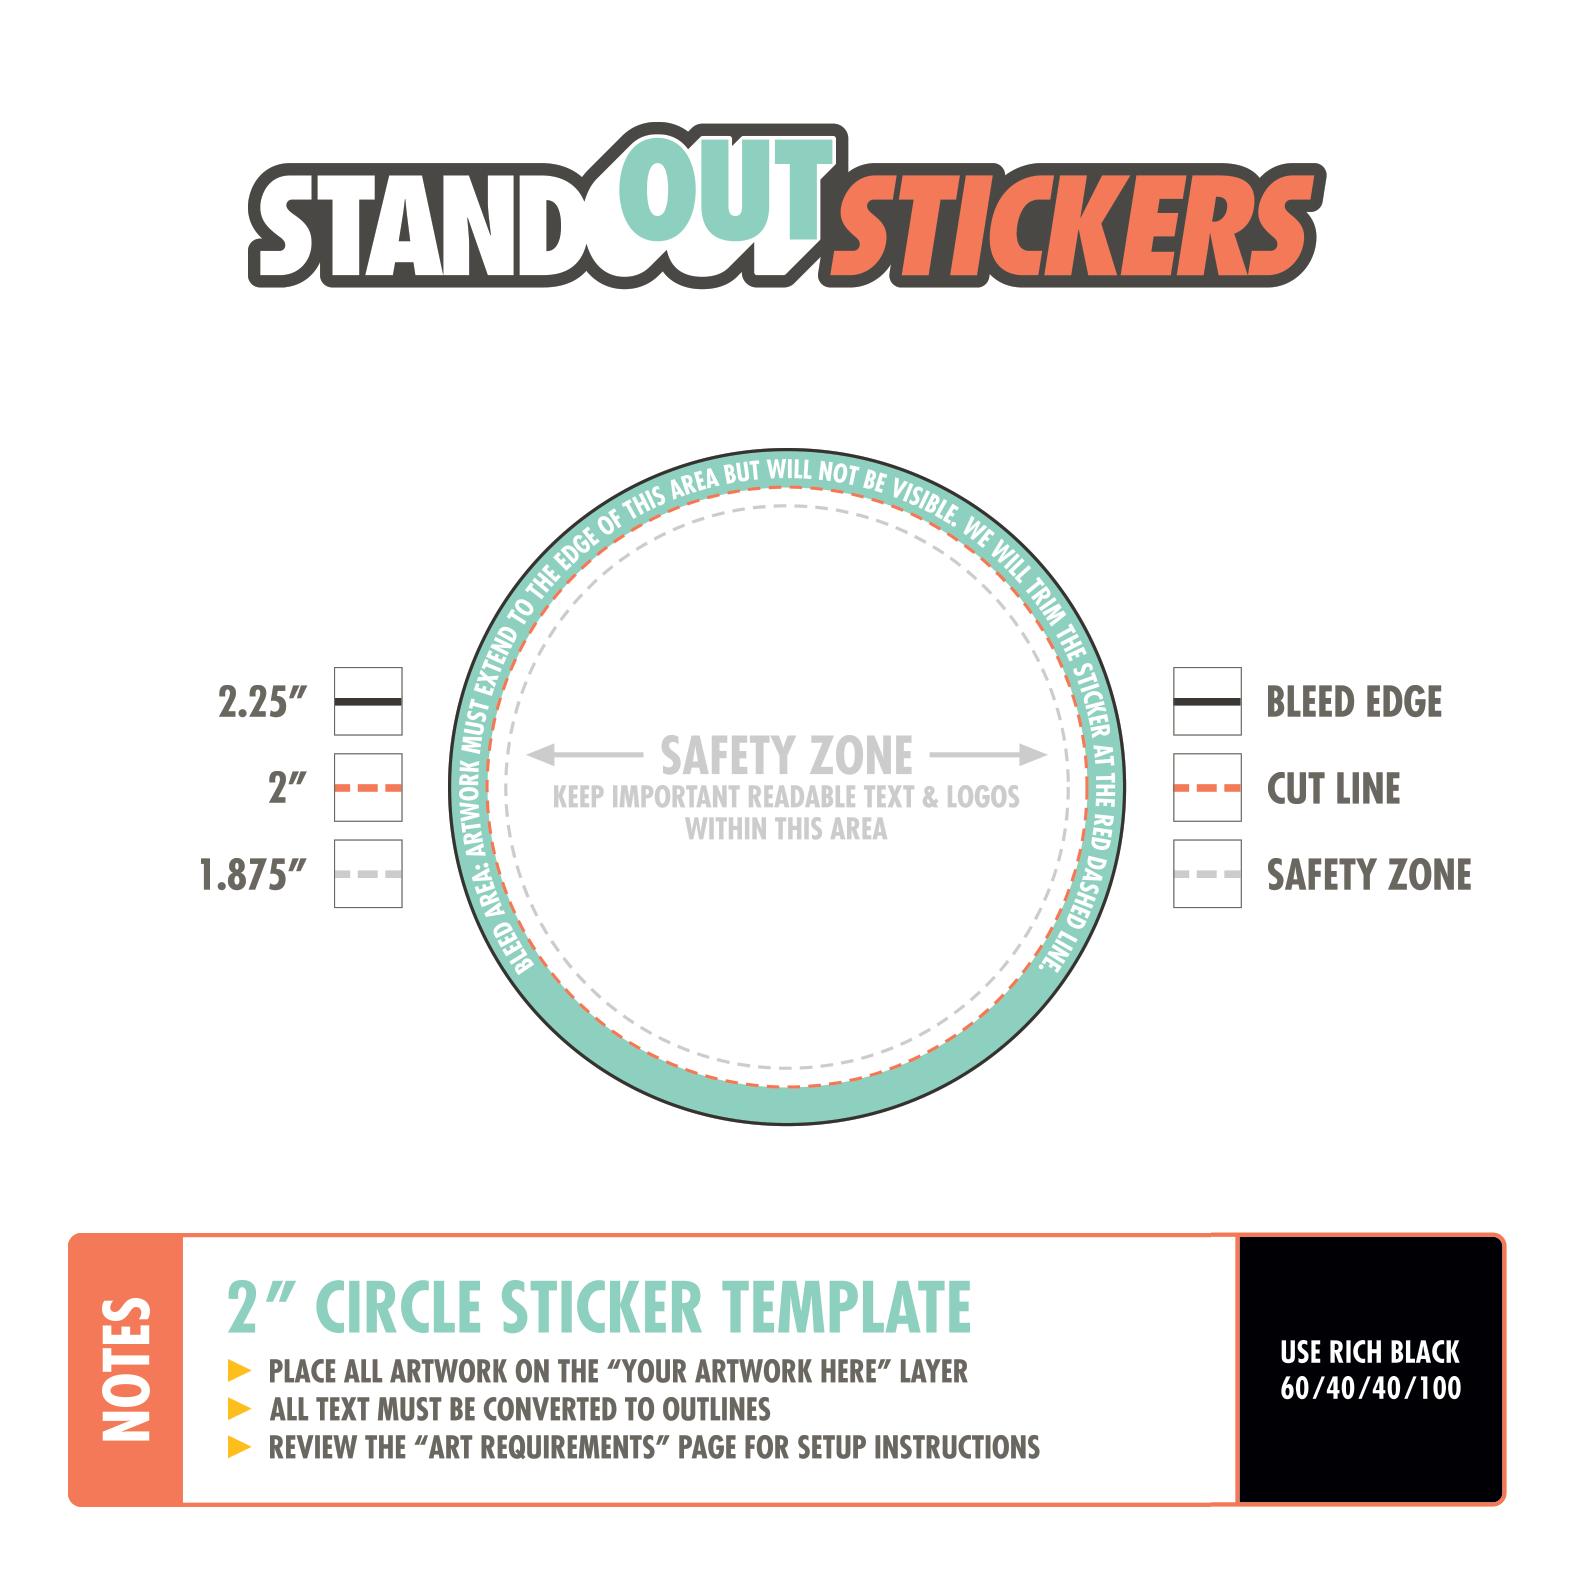 StandOut Stickers Logo - PaleBird